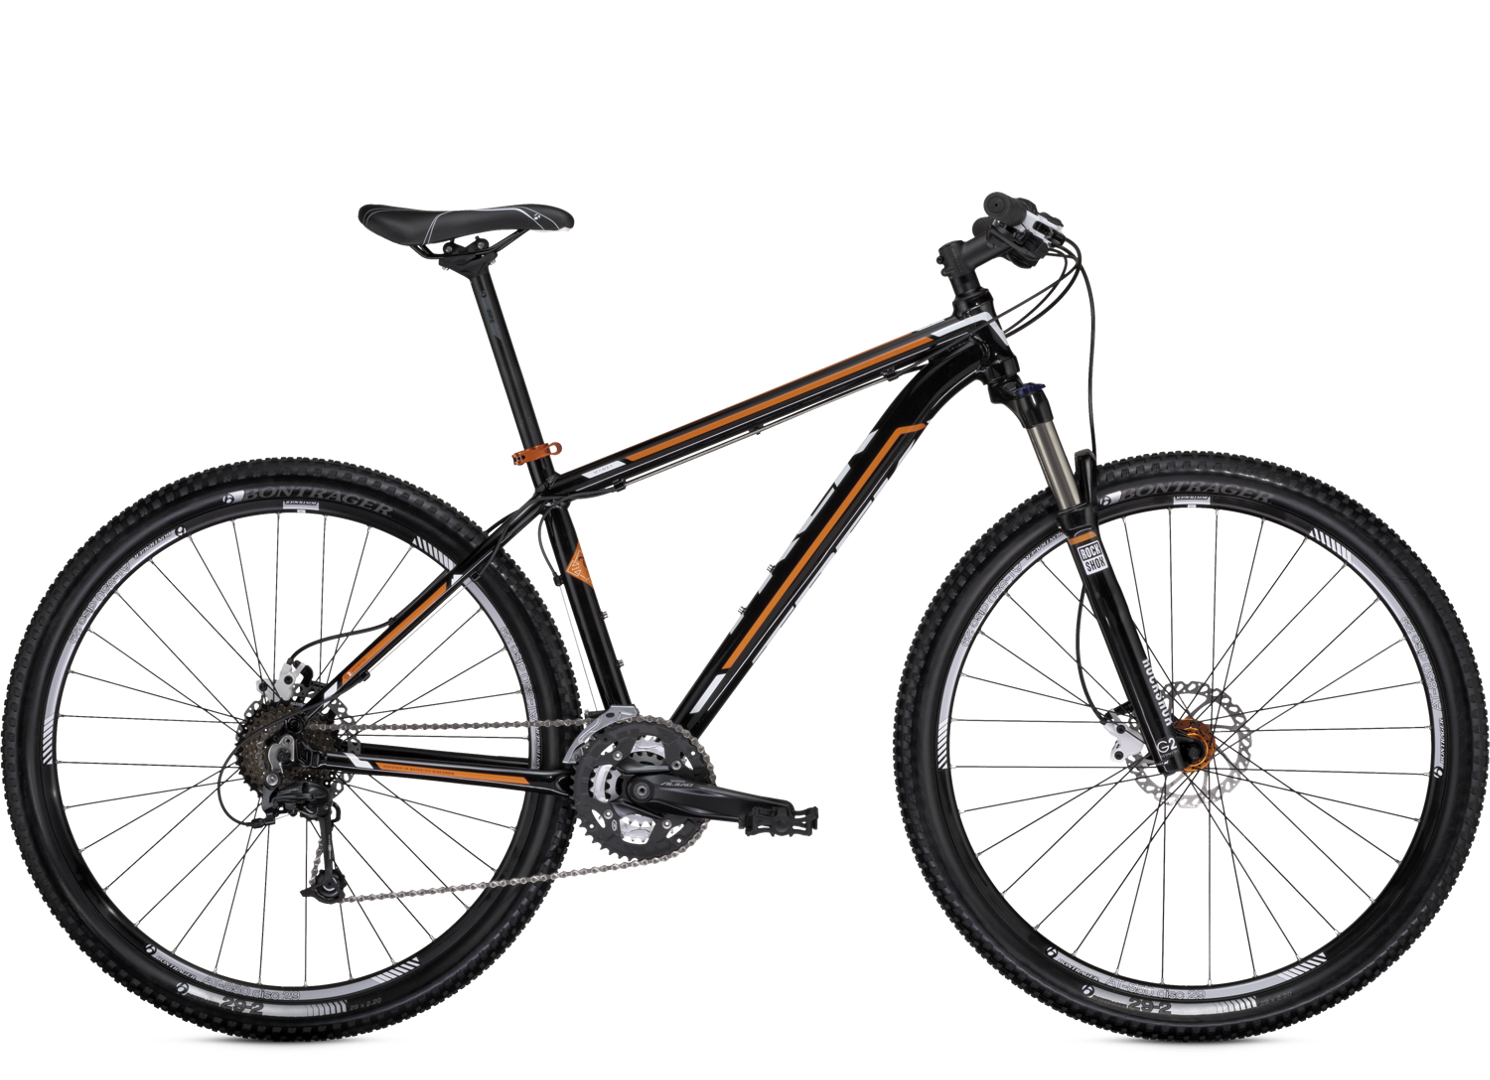 5c43d5a814d 2013 Mamba - Bike Archive - Trek Bicycle